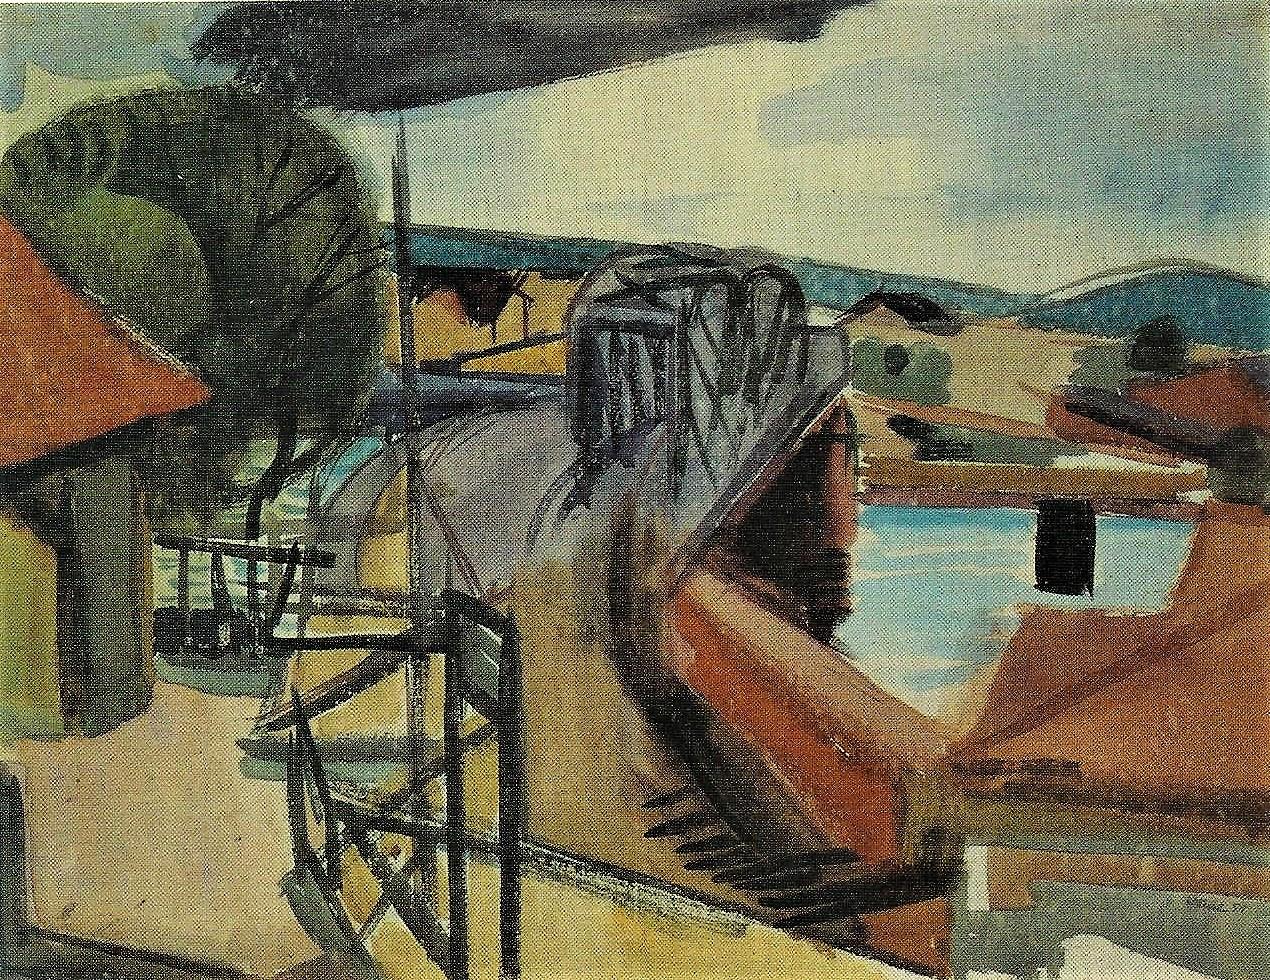 Hans Düne: Eisenbahnbrücke Hameln, 1951